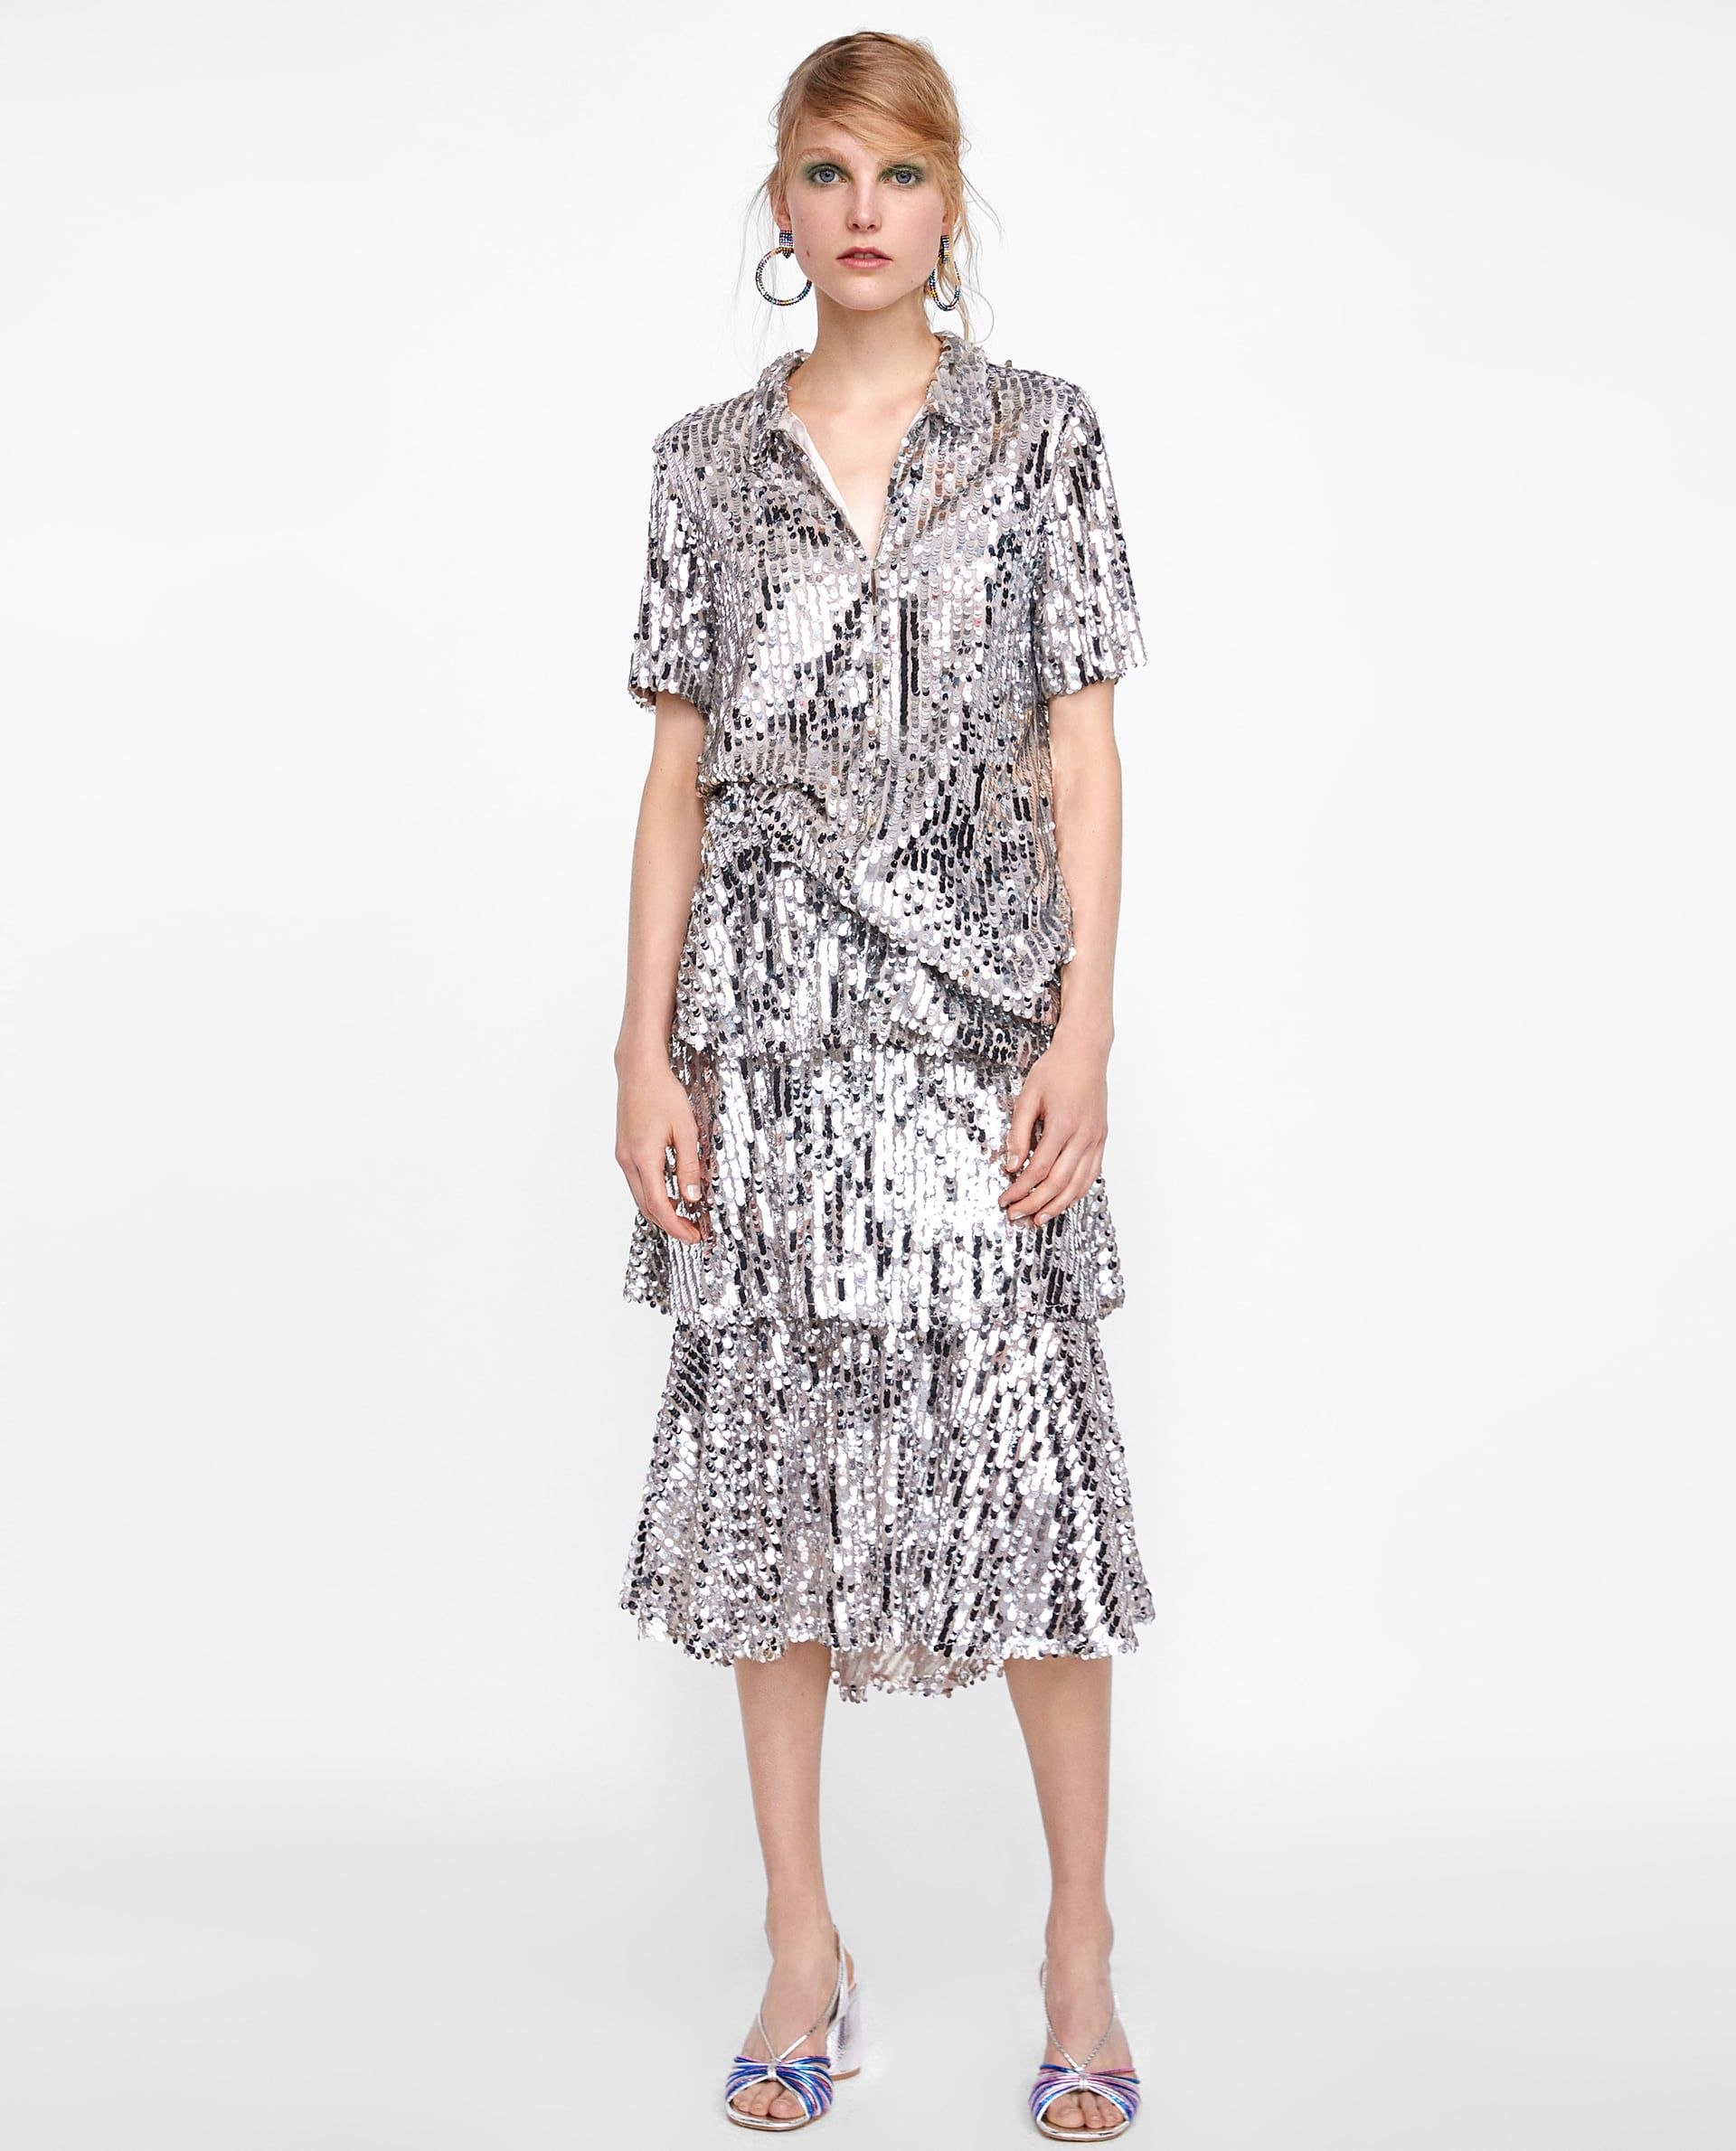 f38eee2c VESTIDO CAMISERO LENTEJUELAS | Fashions | Zara dresses, Dresses ...